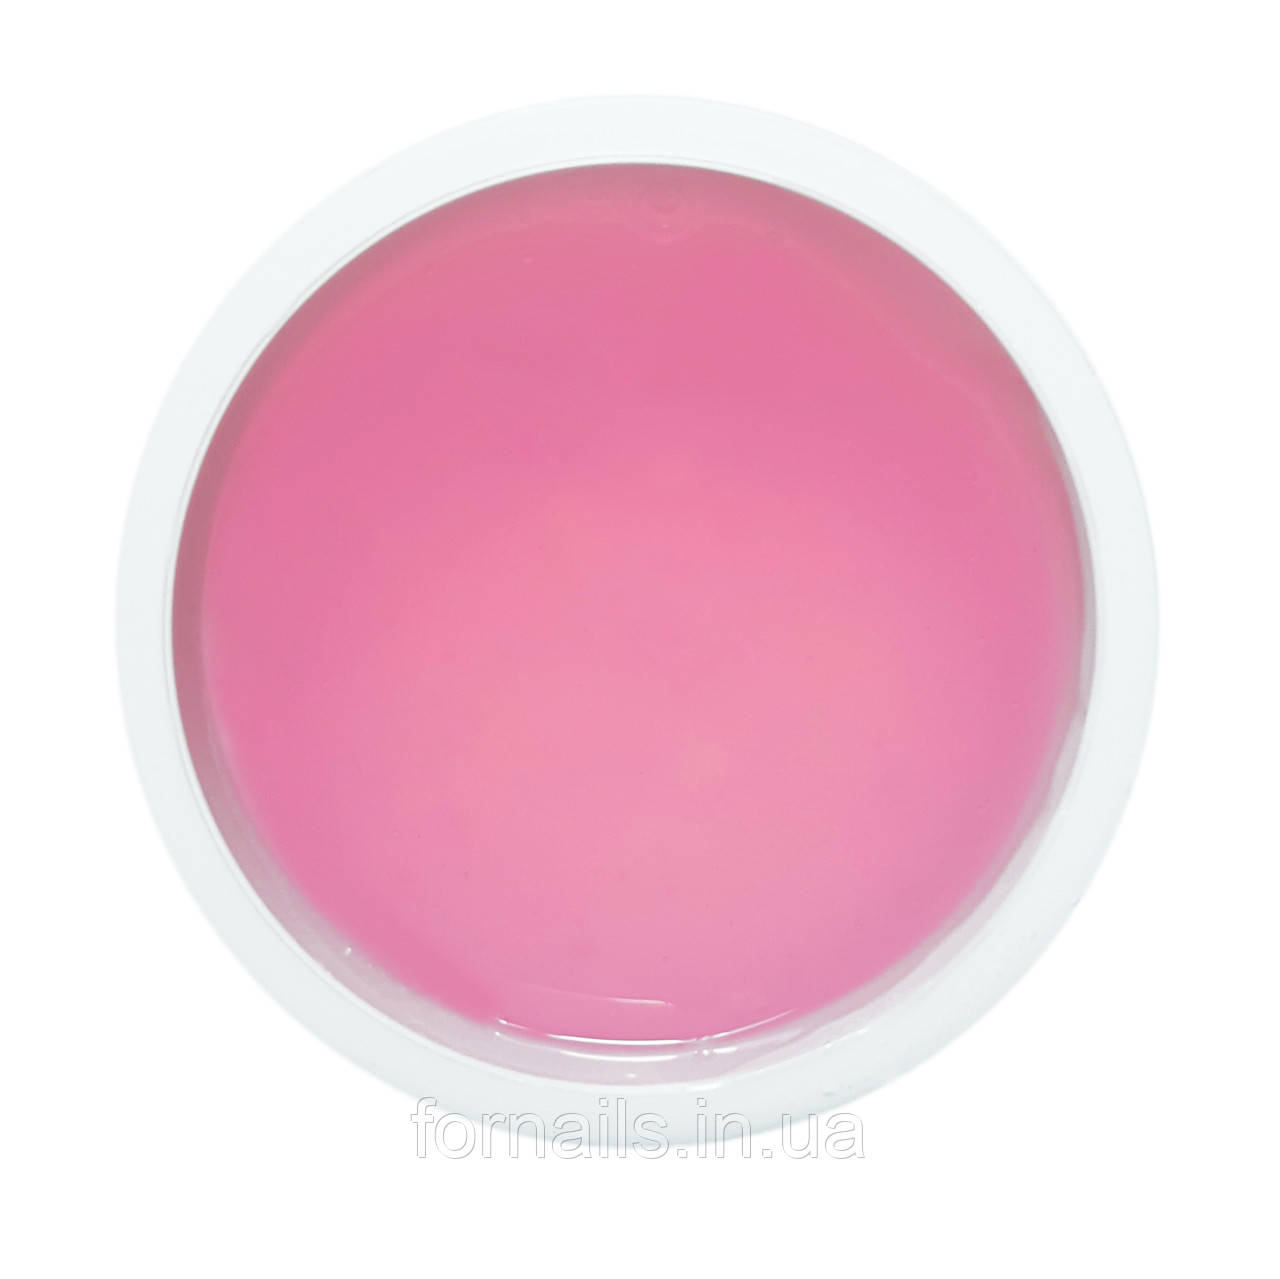 Soft Care Pink, прозрачно-розовый 50g